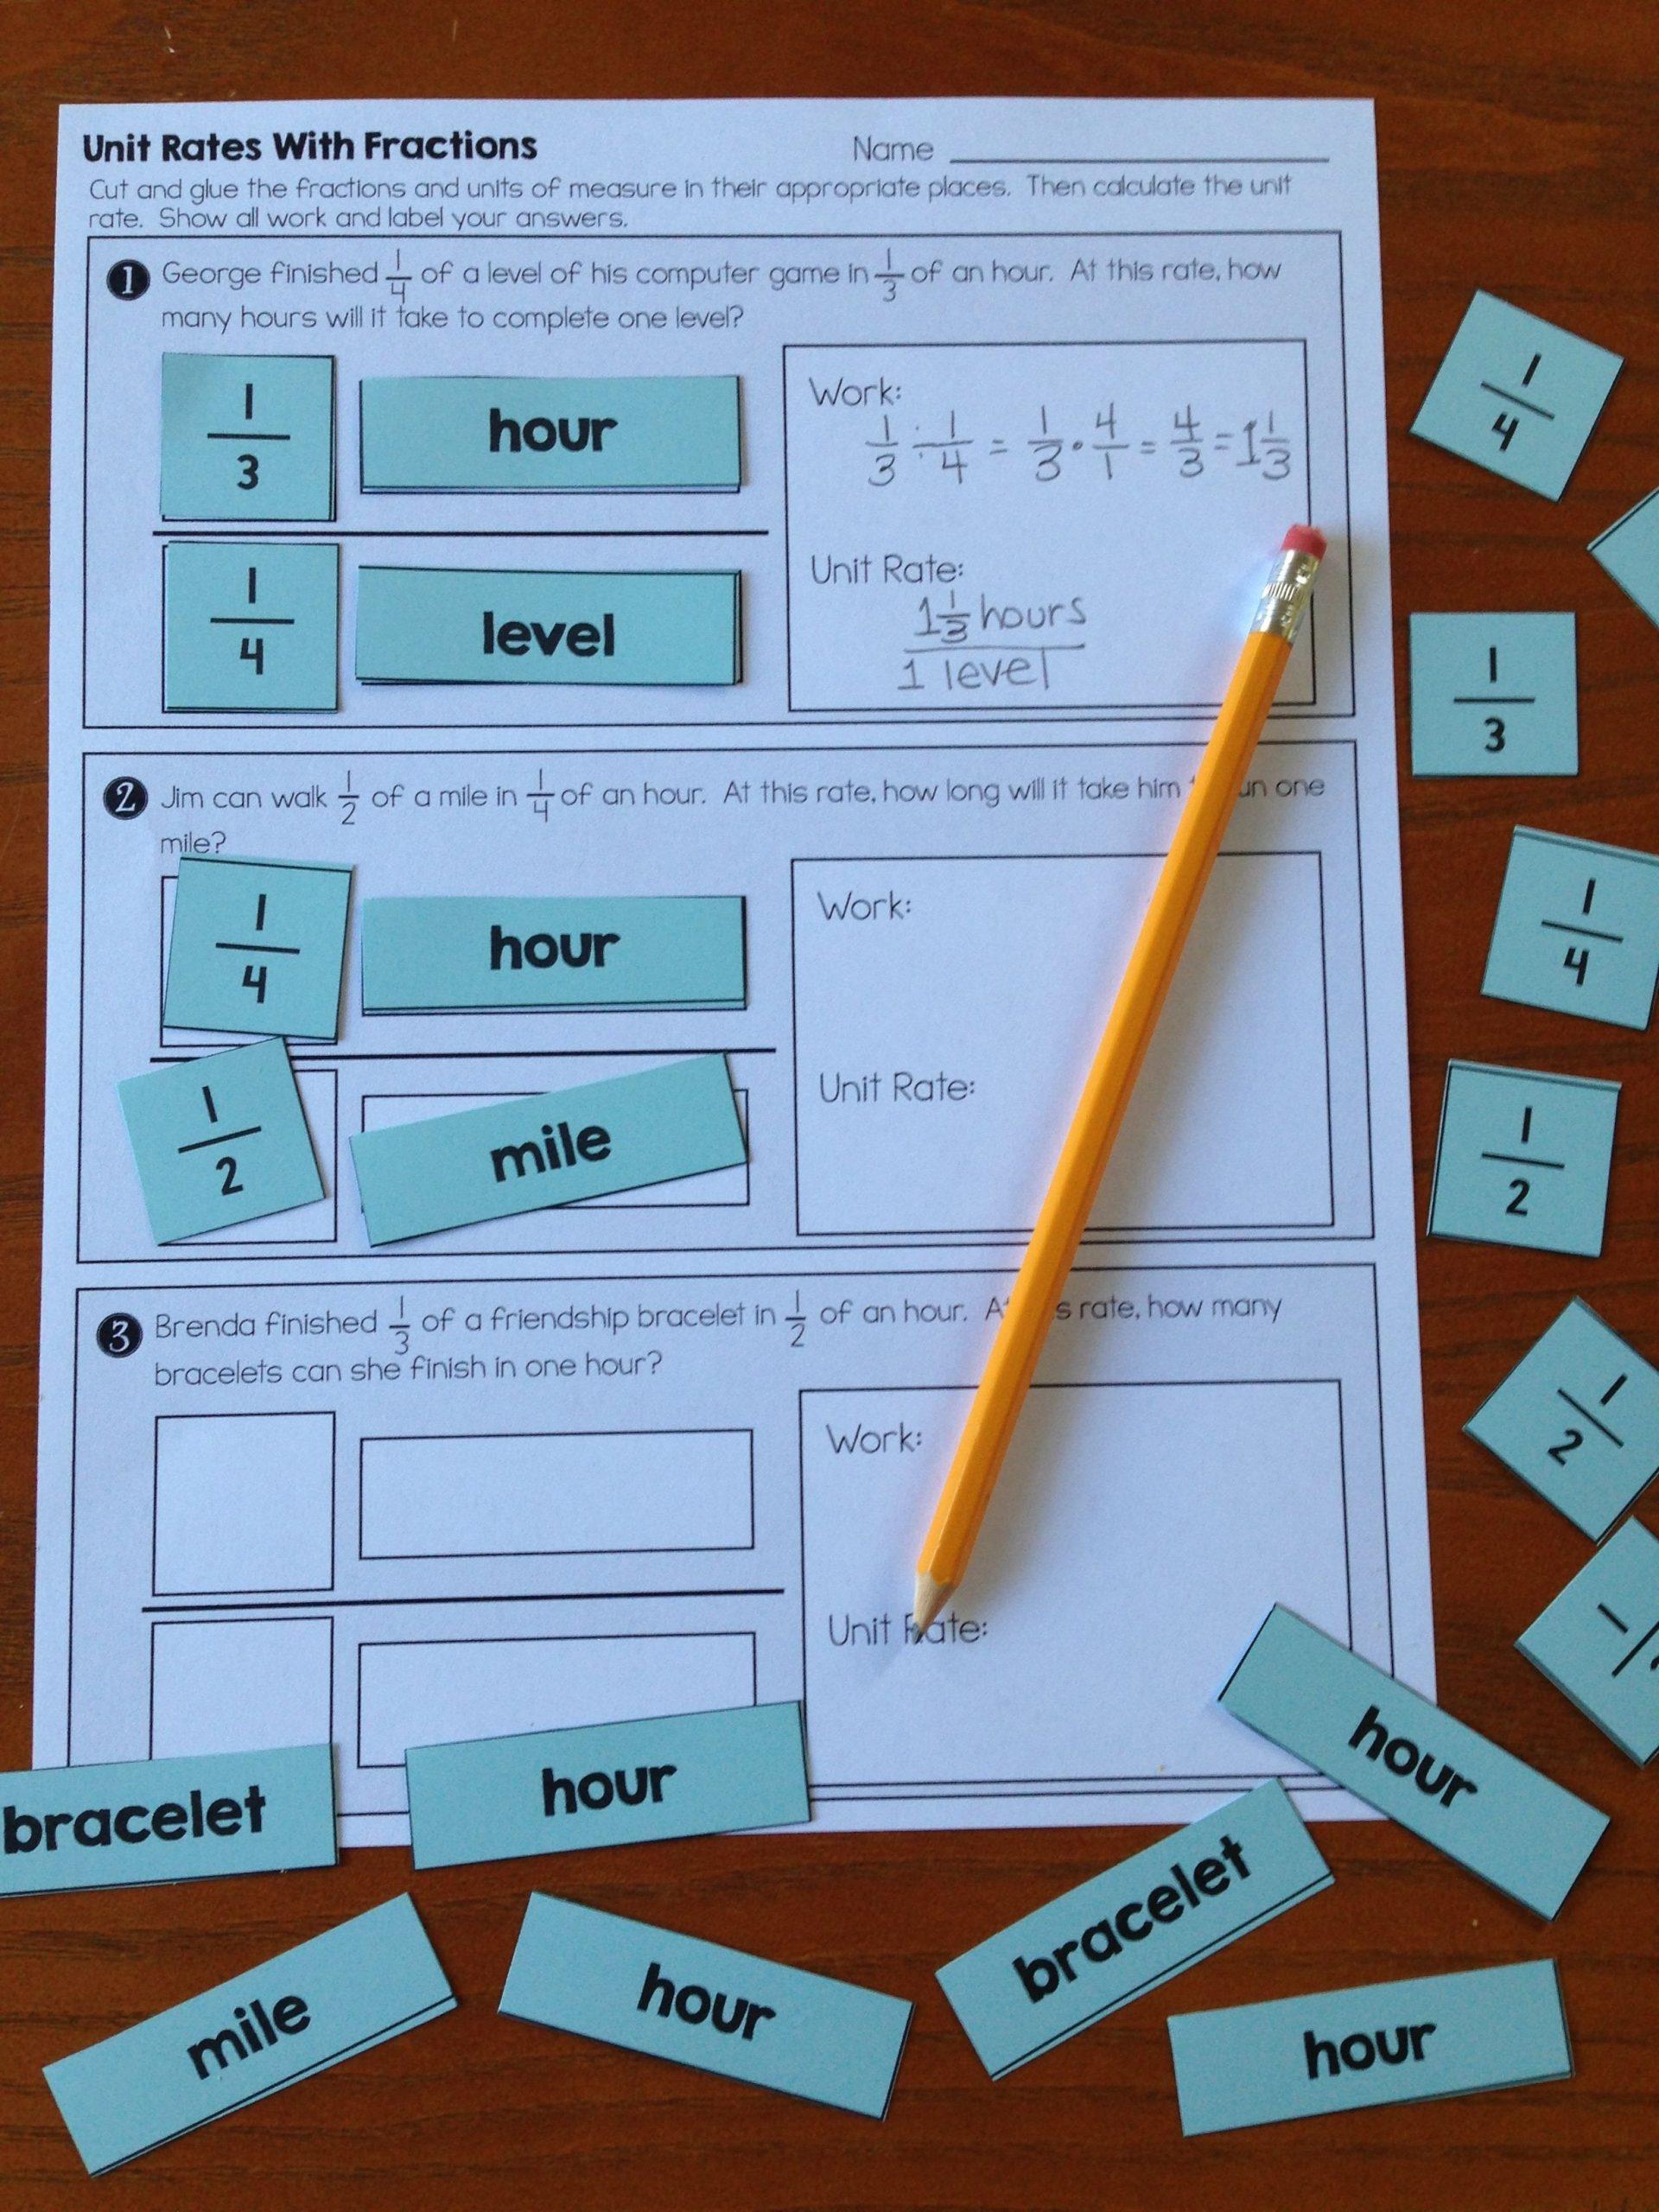 Unit Rate Worksheet 7th Grade Pin On Math Grades 7 12